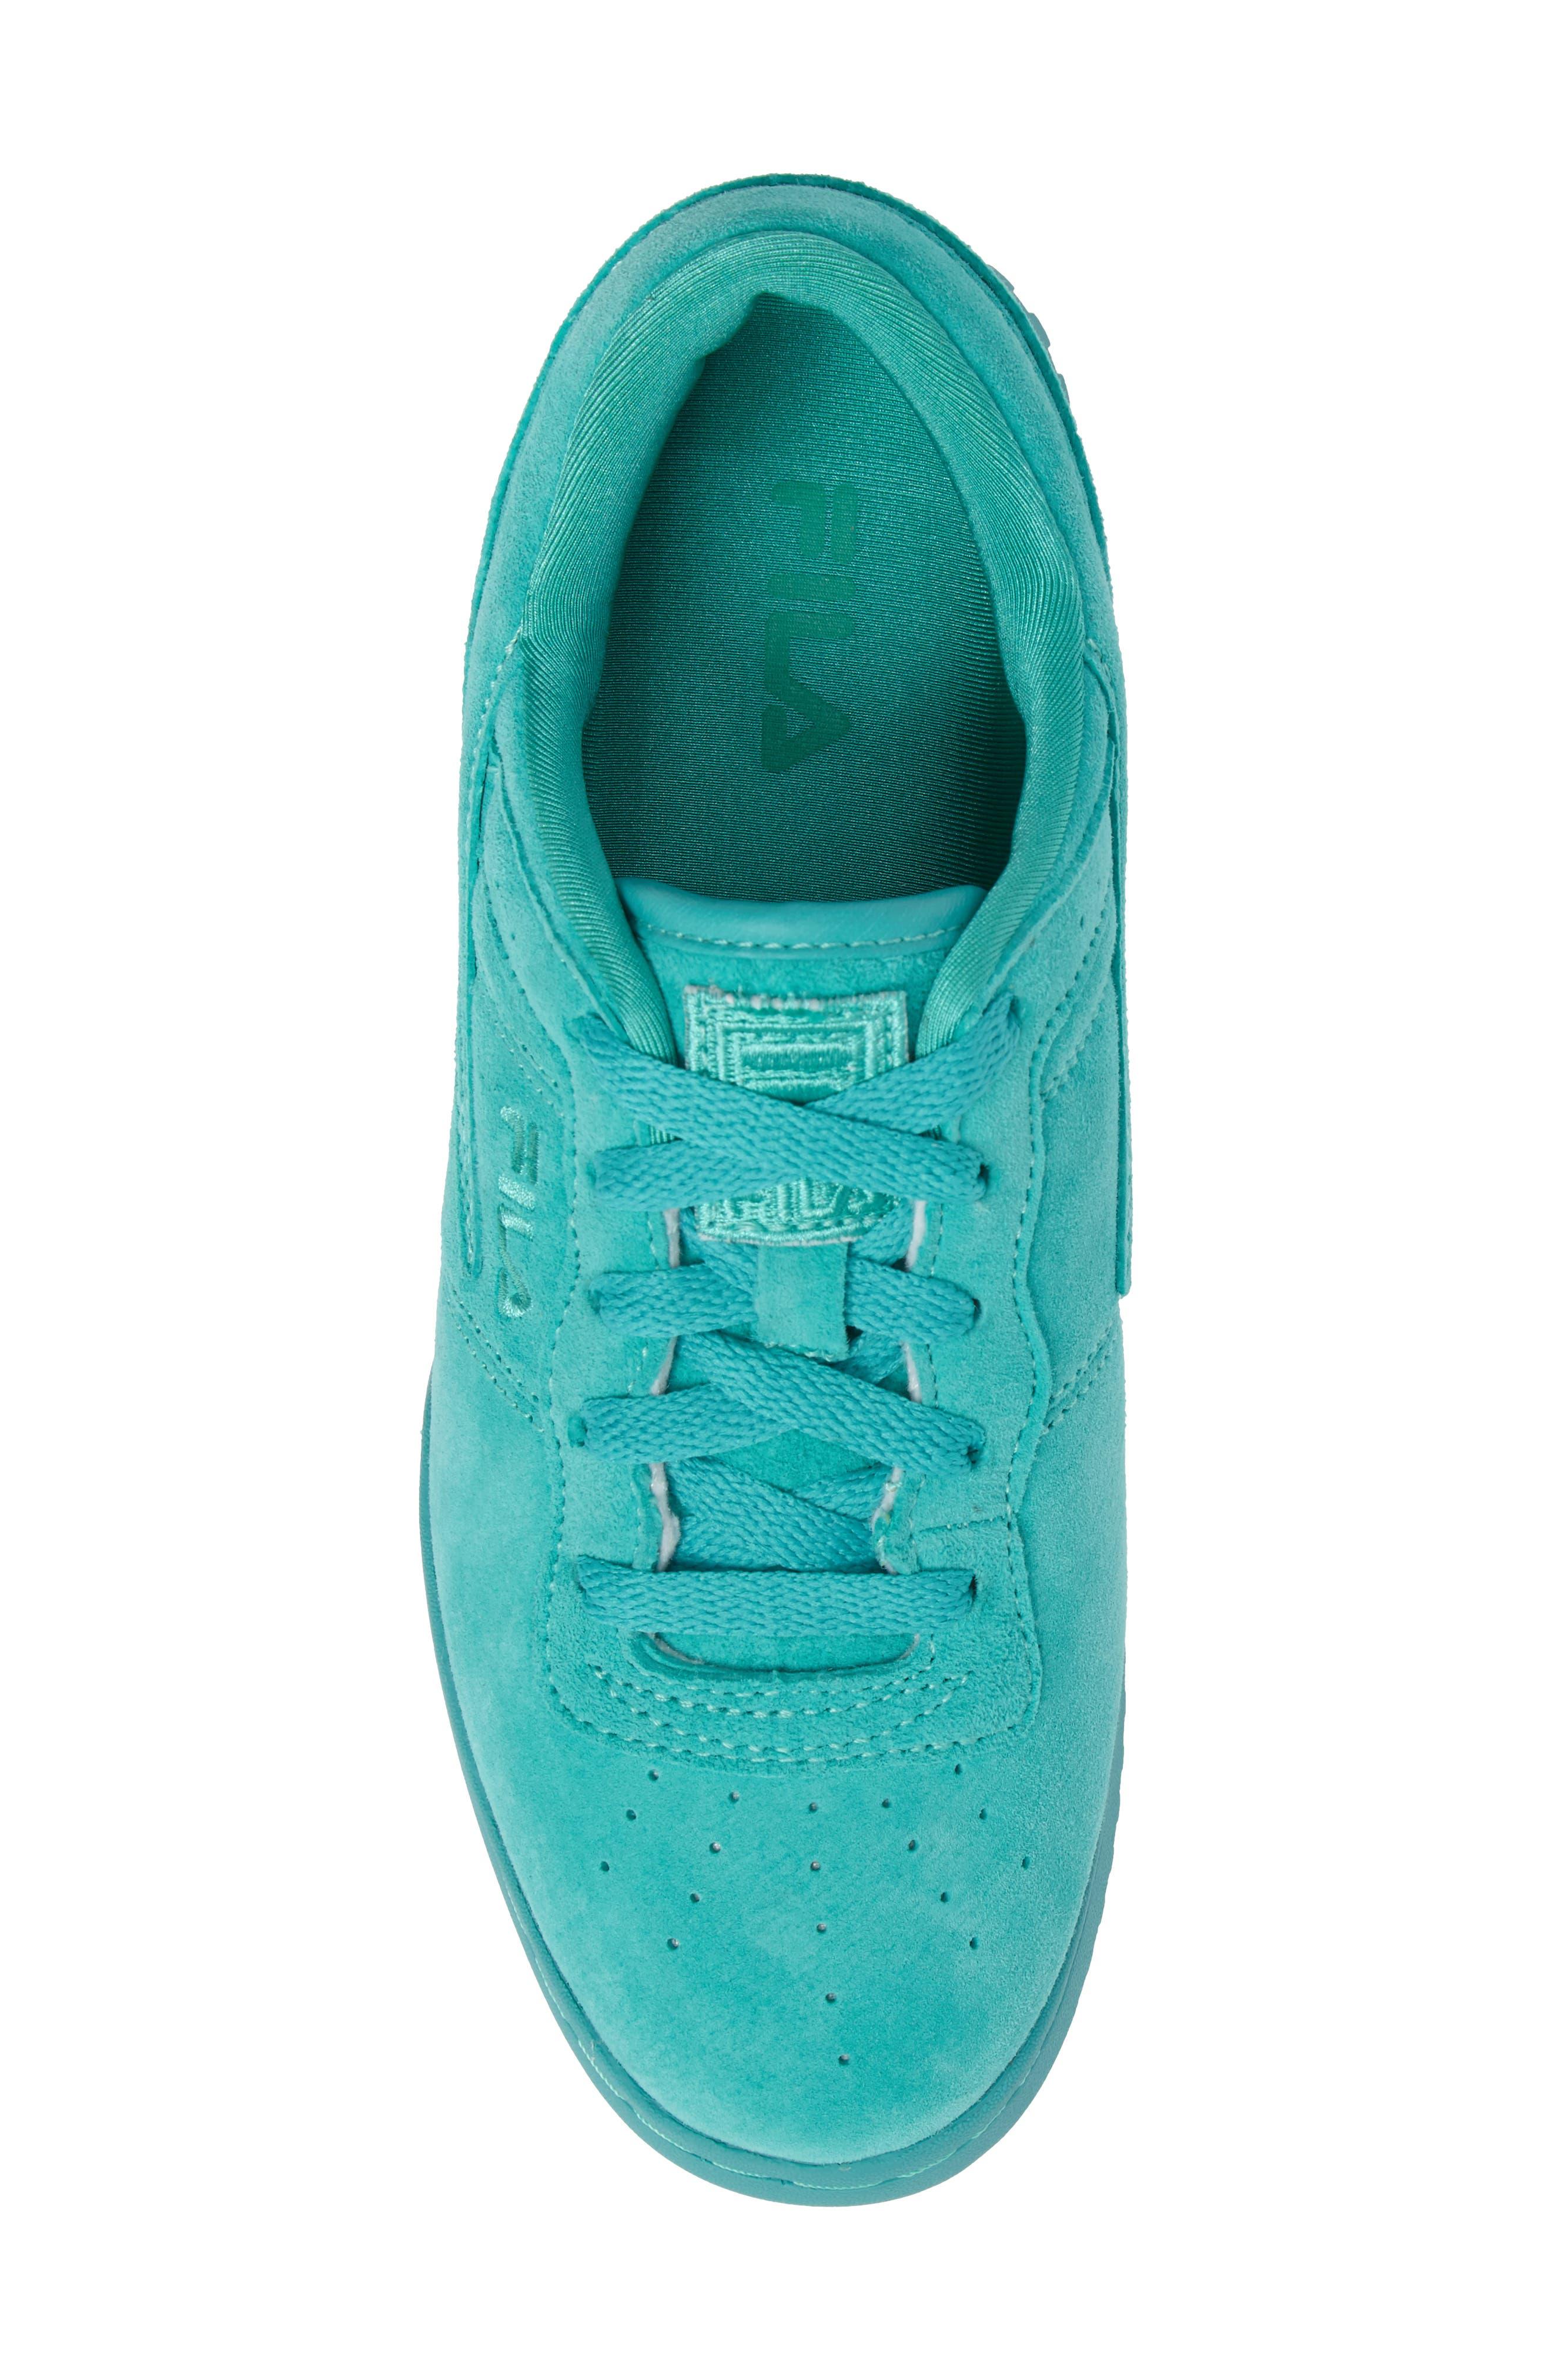 Original Fitness Sneaker,                             Alternate thumbnail 5, color,                             Sea Foam